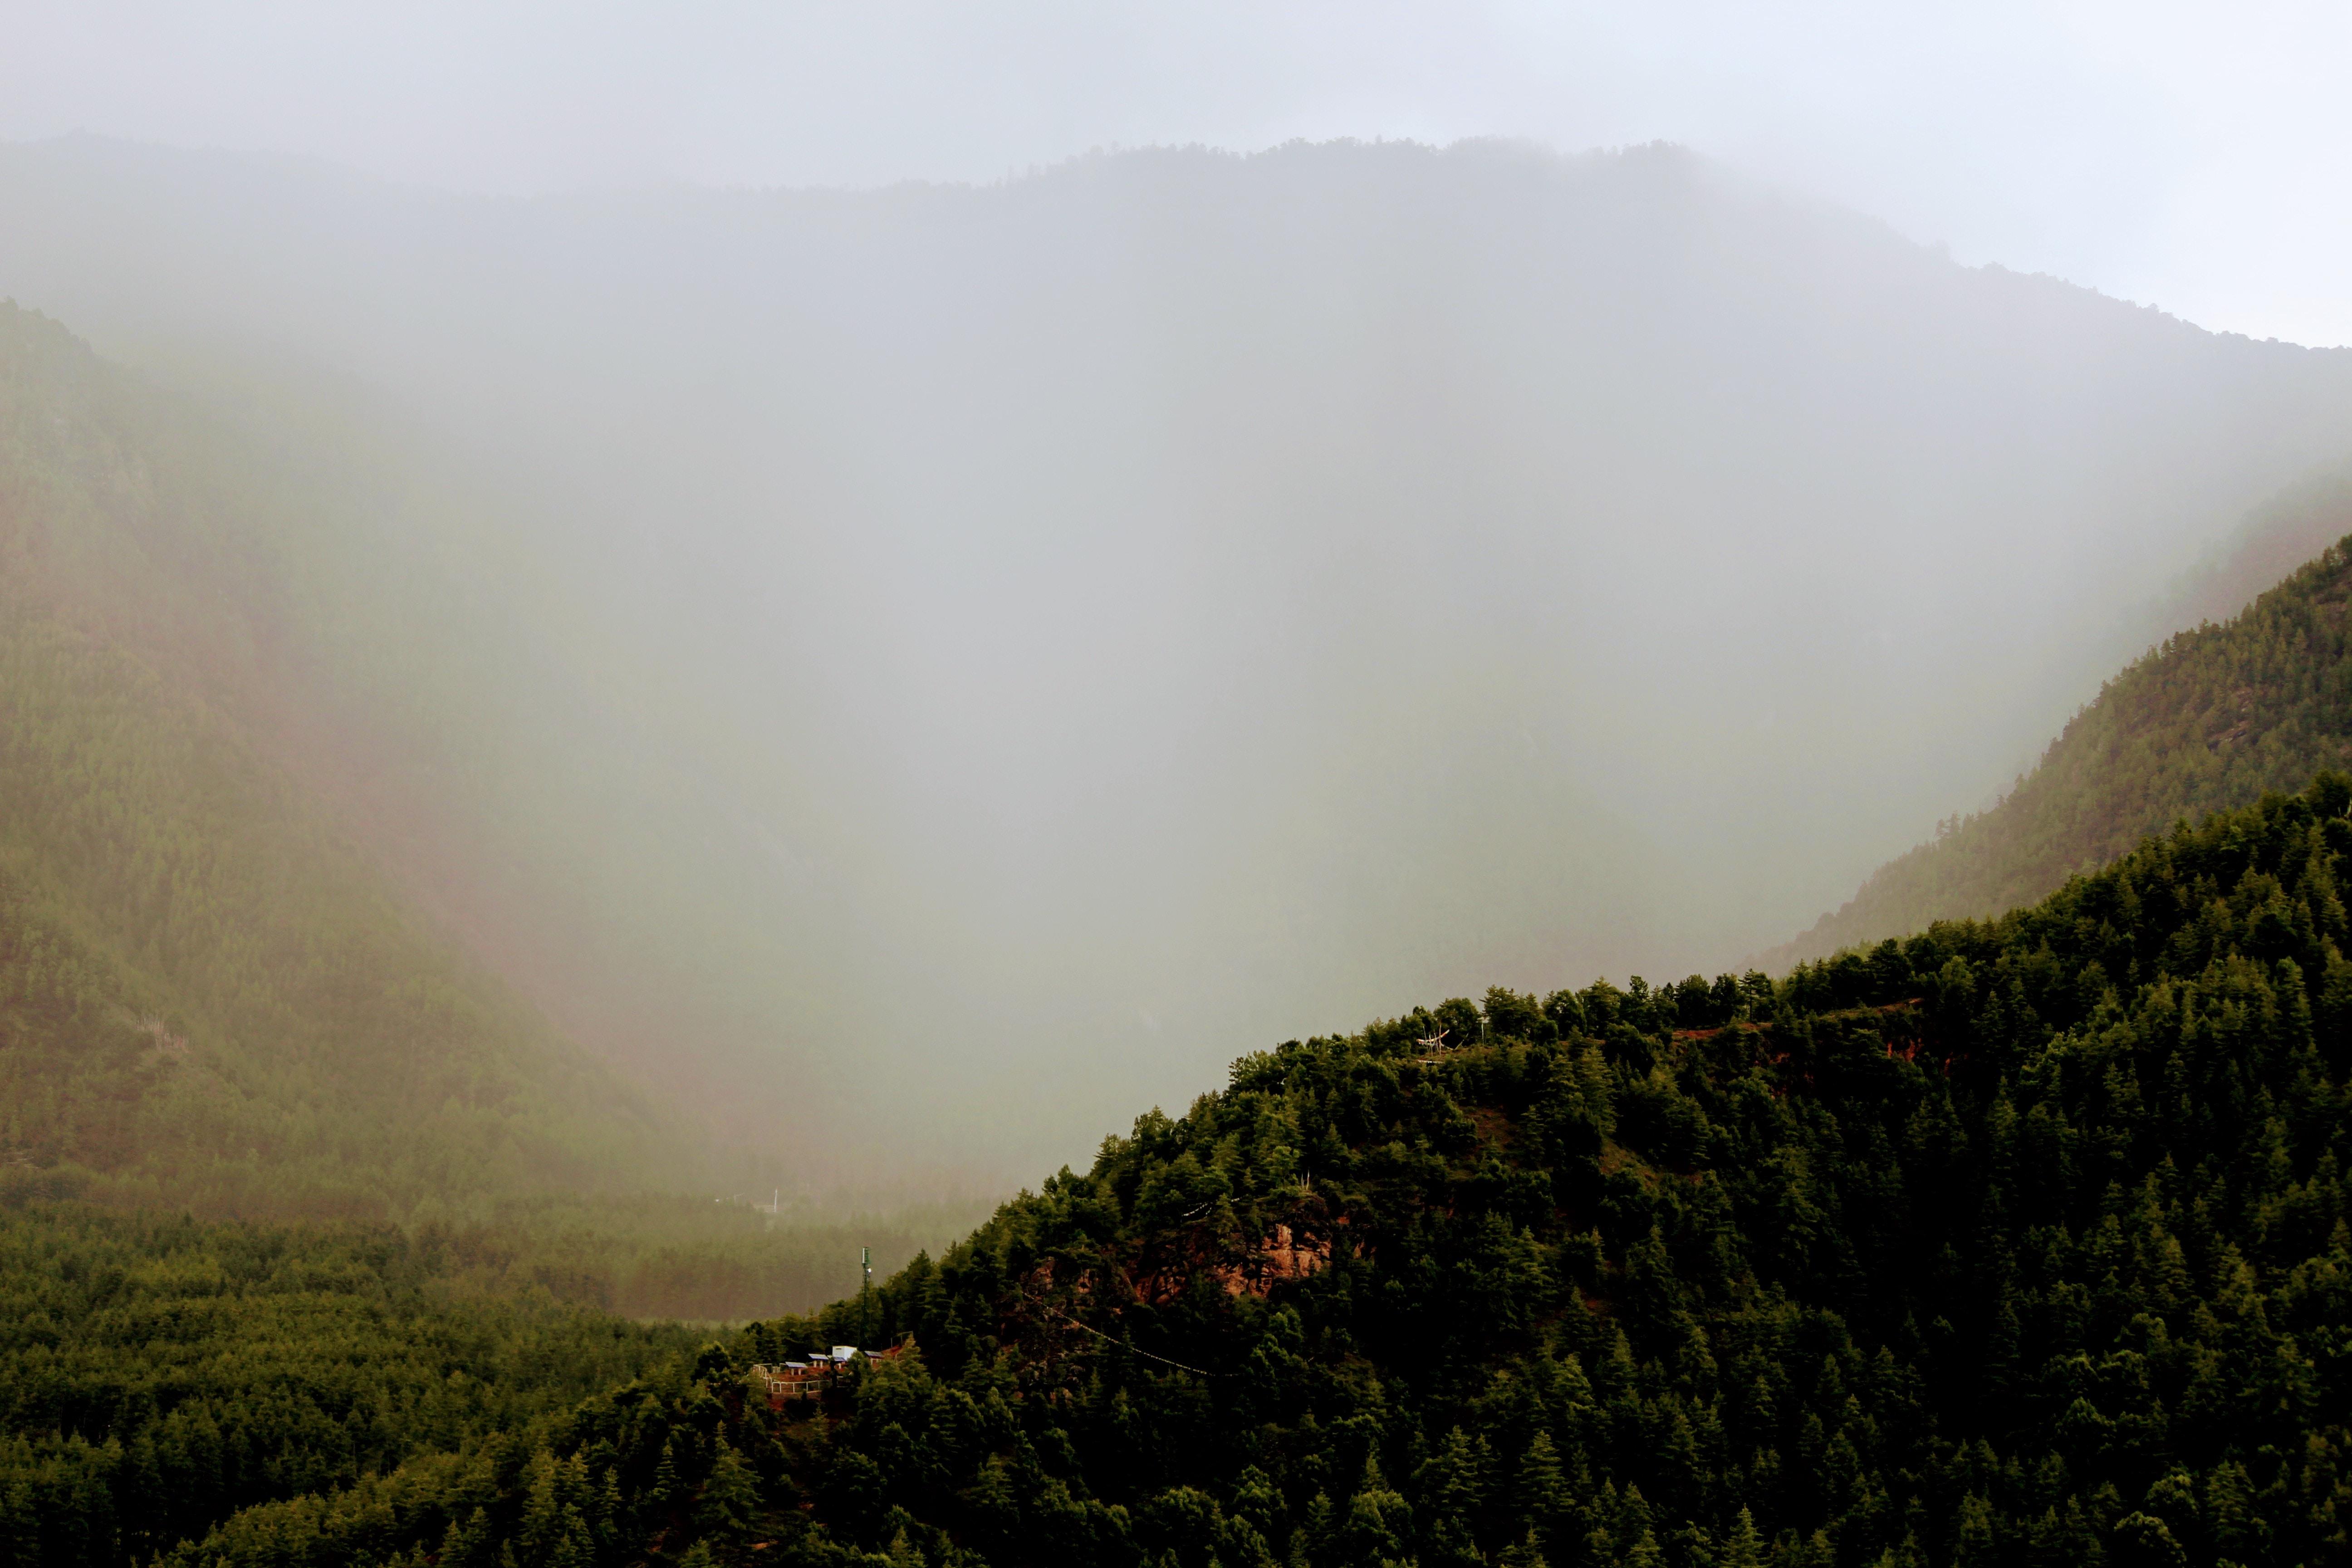 trees near mountain during daytime